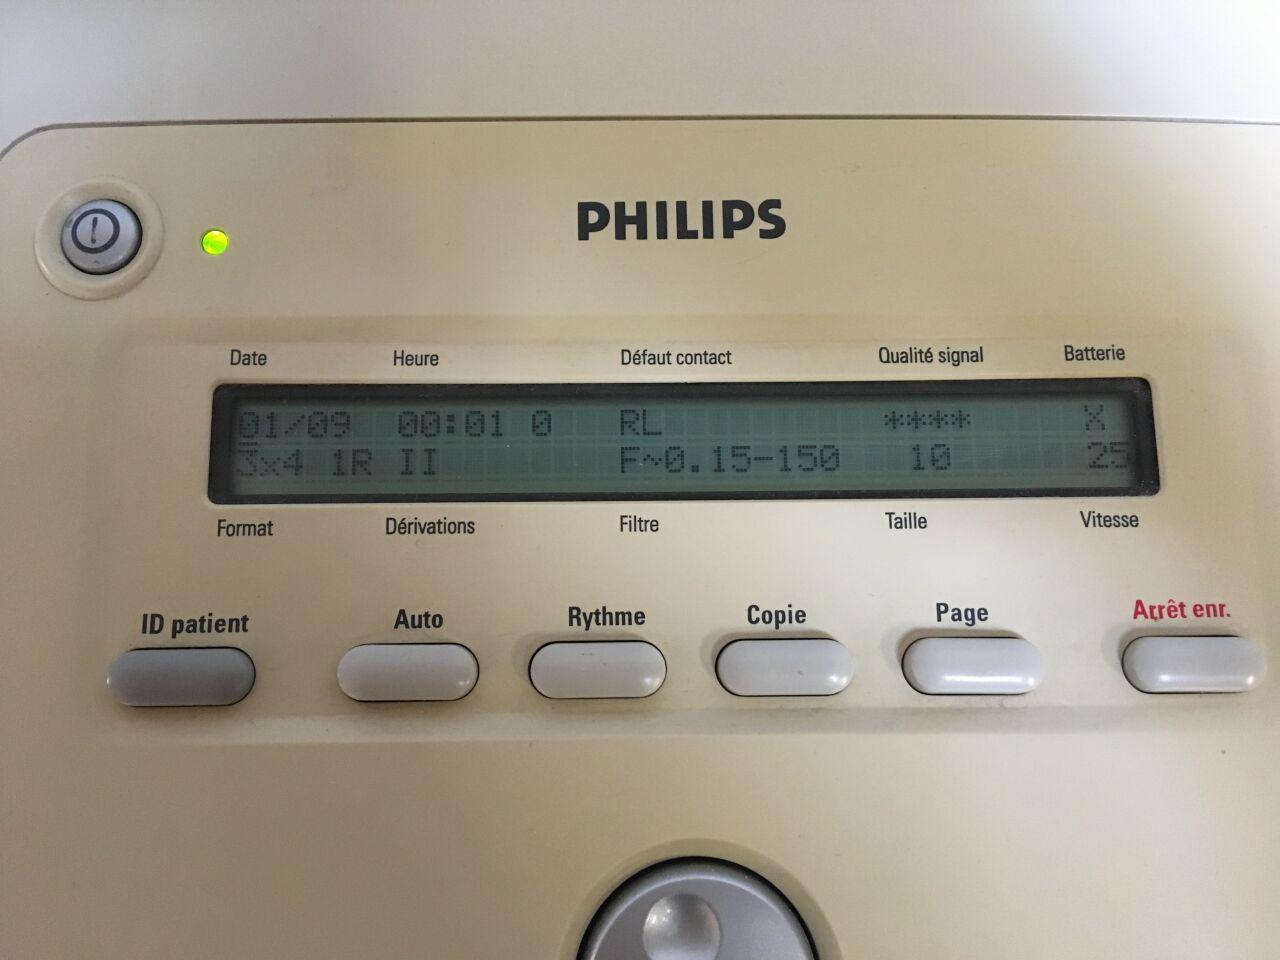 PHILIPS Page Writer trim 1 ECG unit